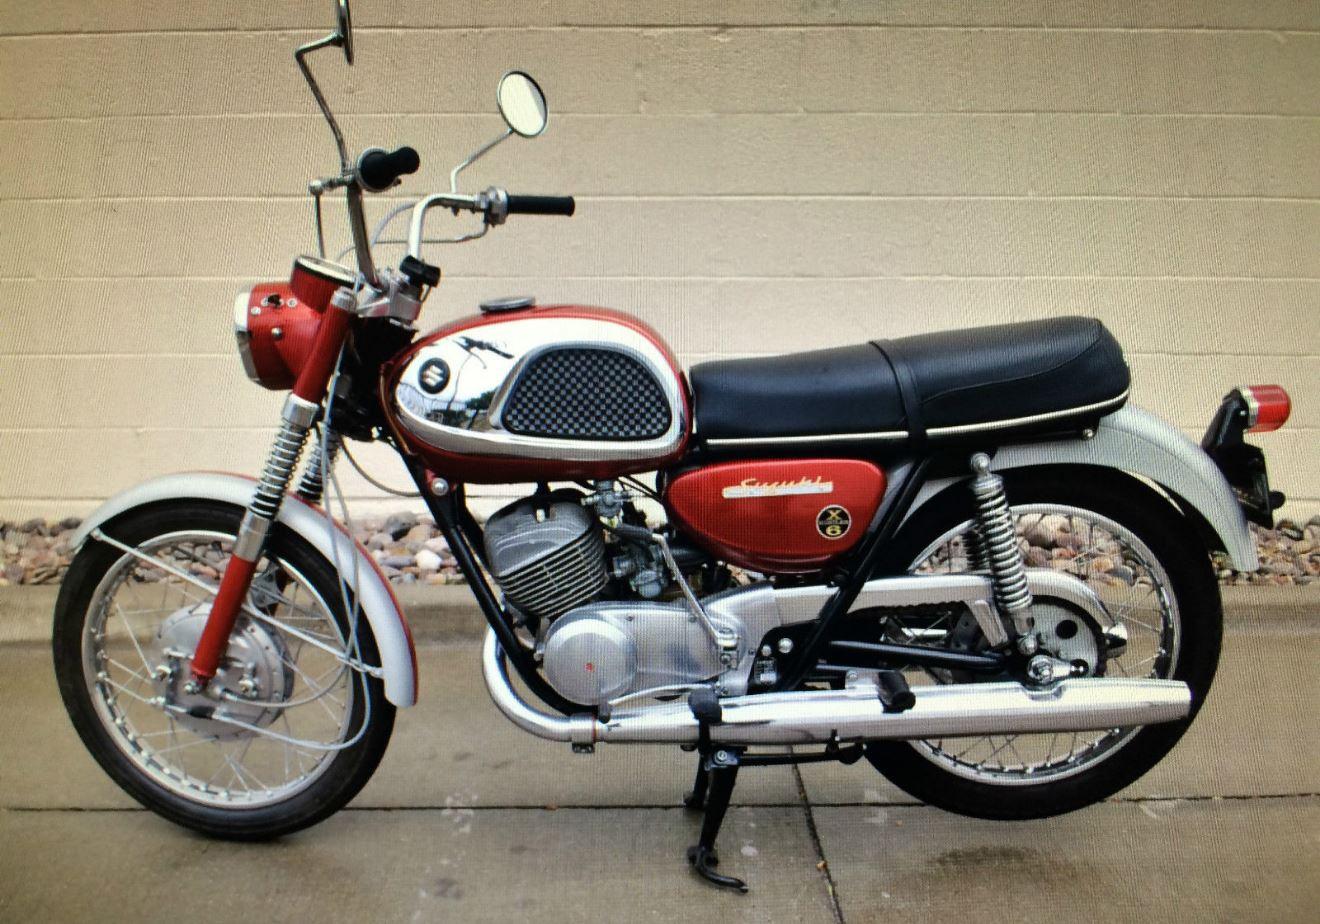 1967 suzuki x-6 hustler | bike-urious